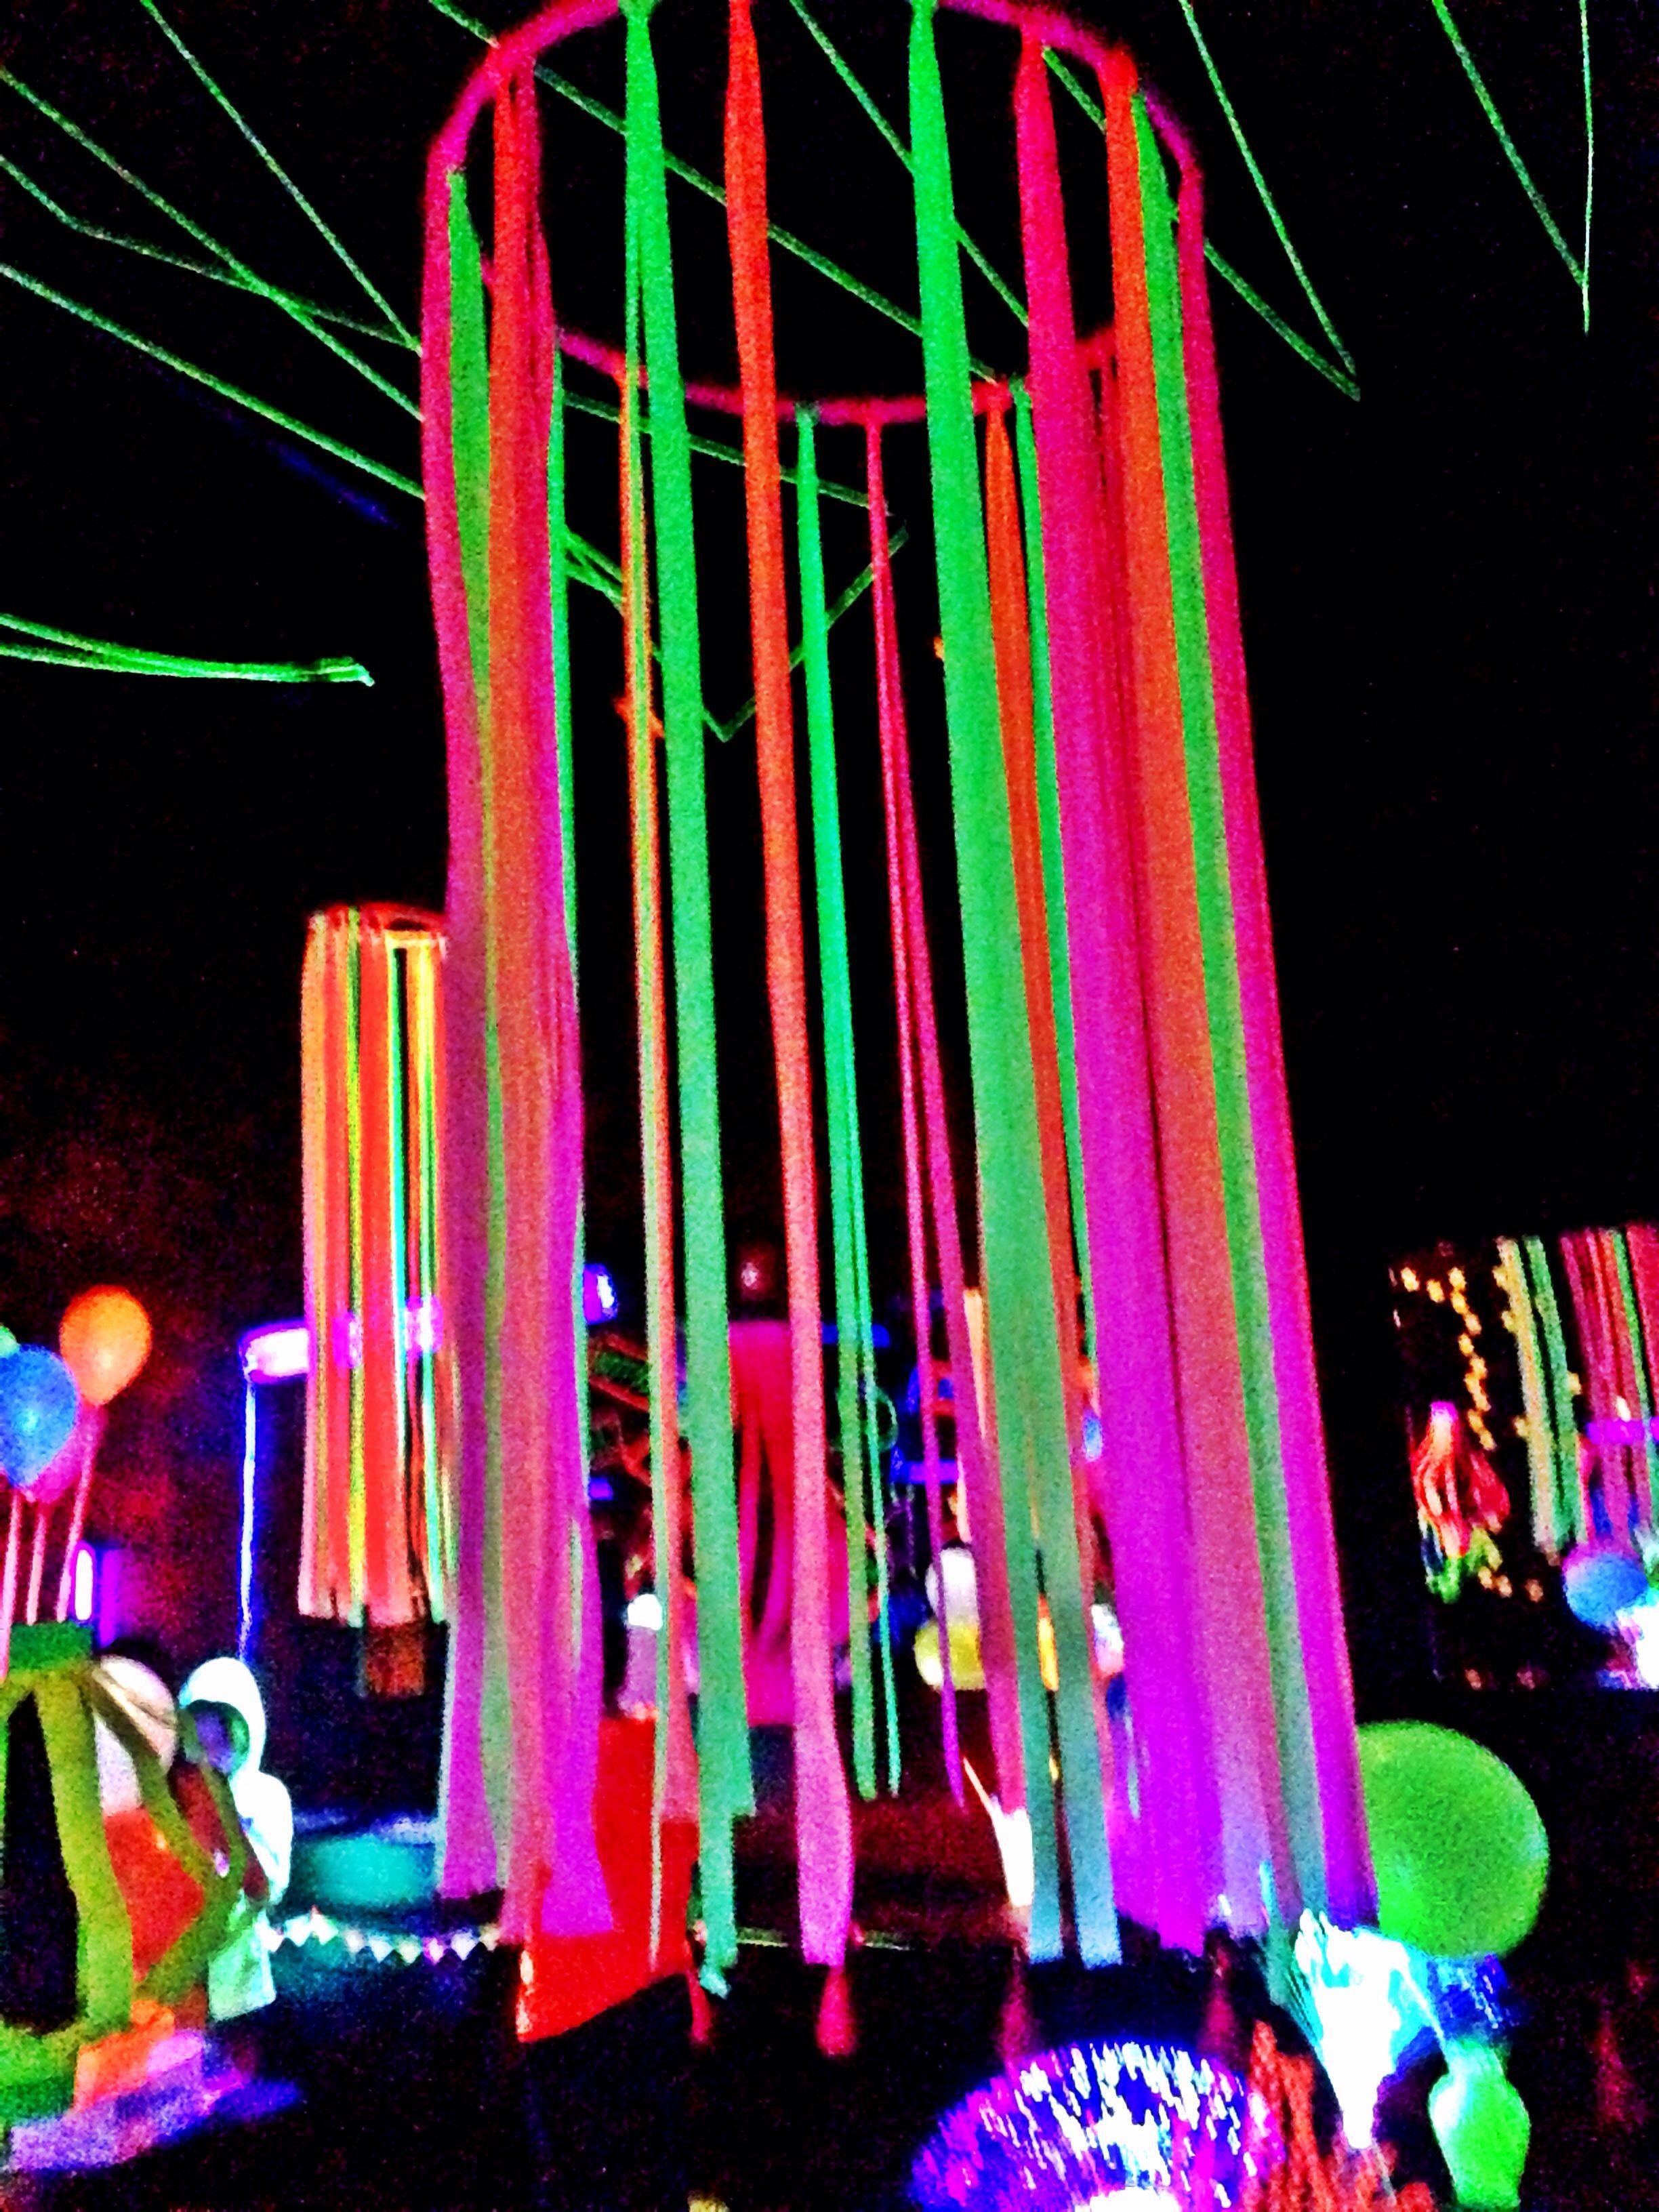 Neon Flagging Tape On Hulla Hoop Glow Party Decoration Fnid More Festival Rave And Edm Stuff Fiestas De Cumpleanos De Neon Fiesta Neon Decoracion Fiesta Neon